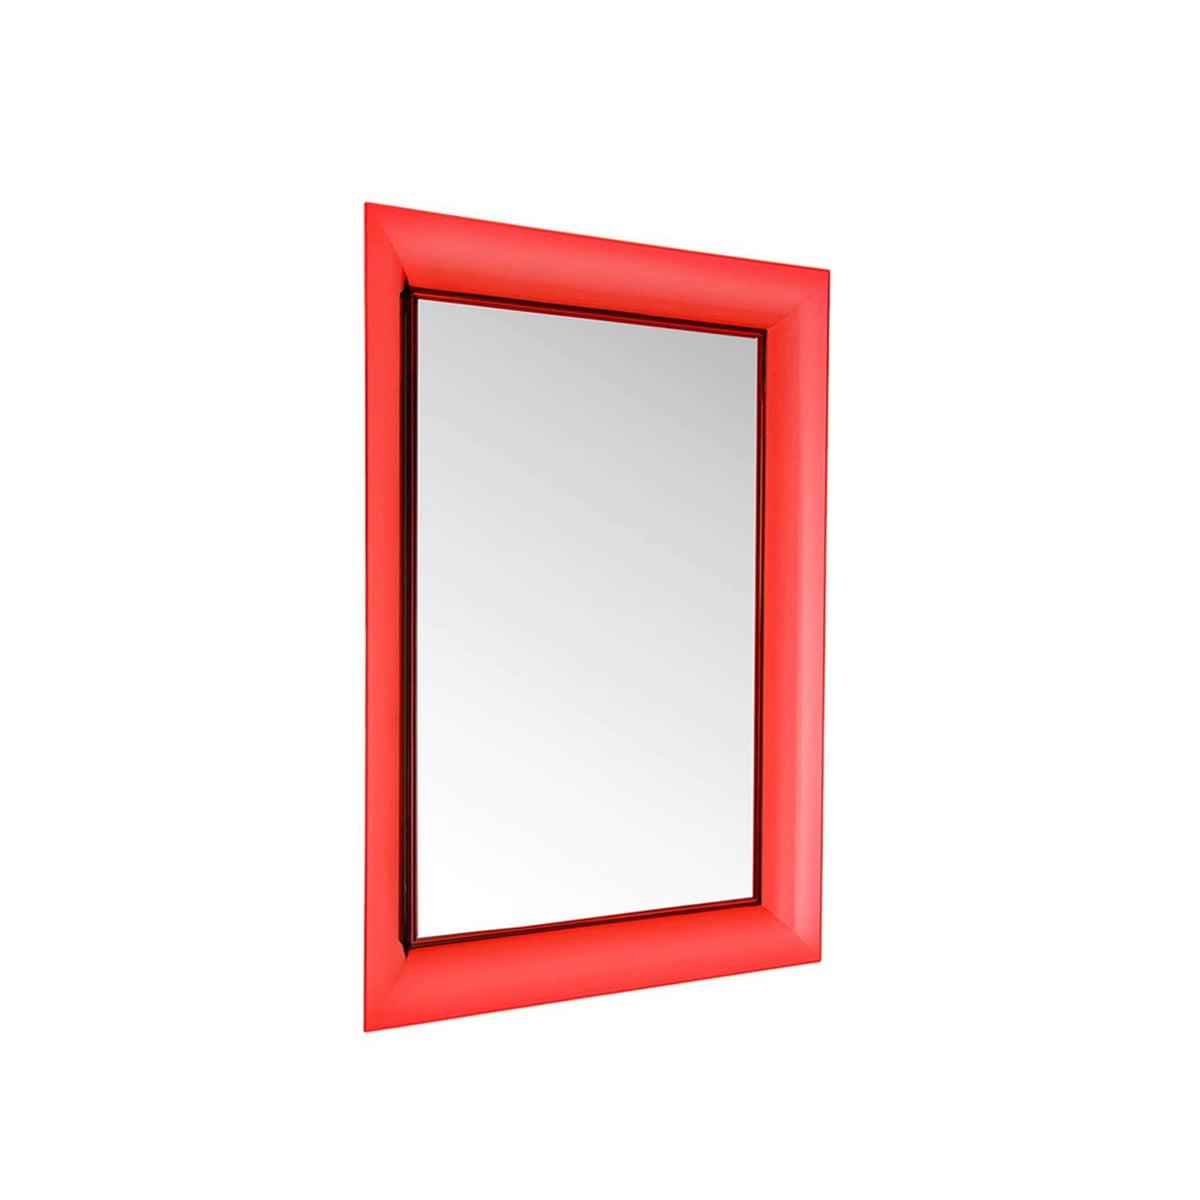 The fran ois ghost mirror by kartell for Miroir francois ghost kartell